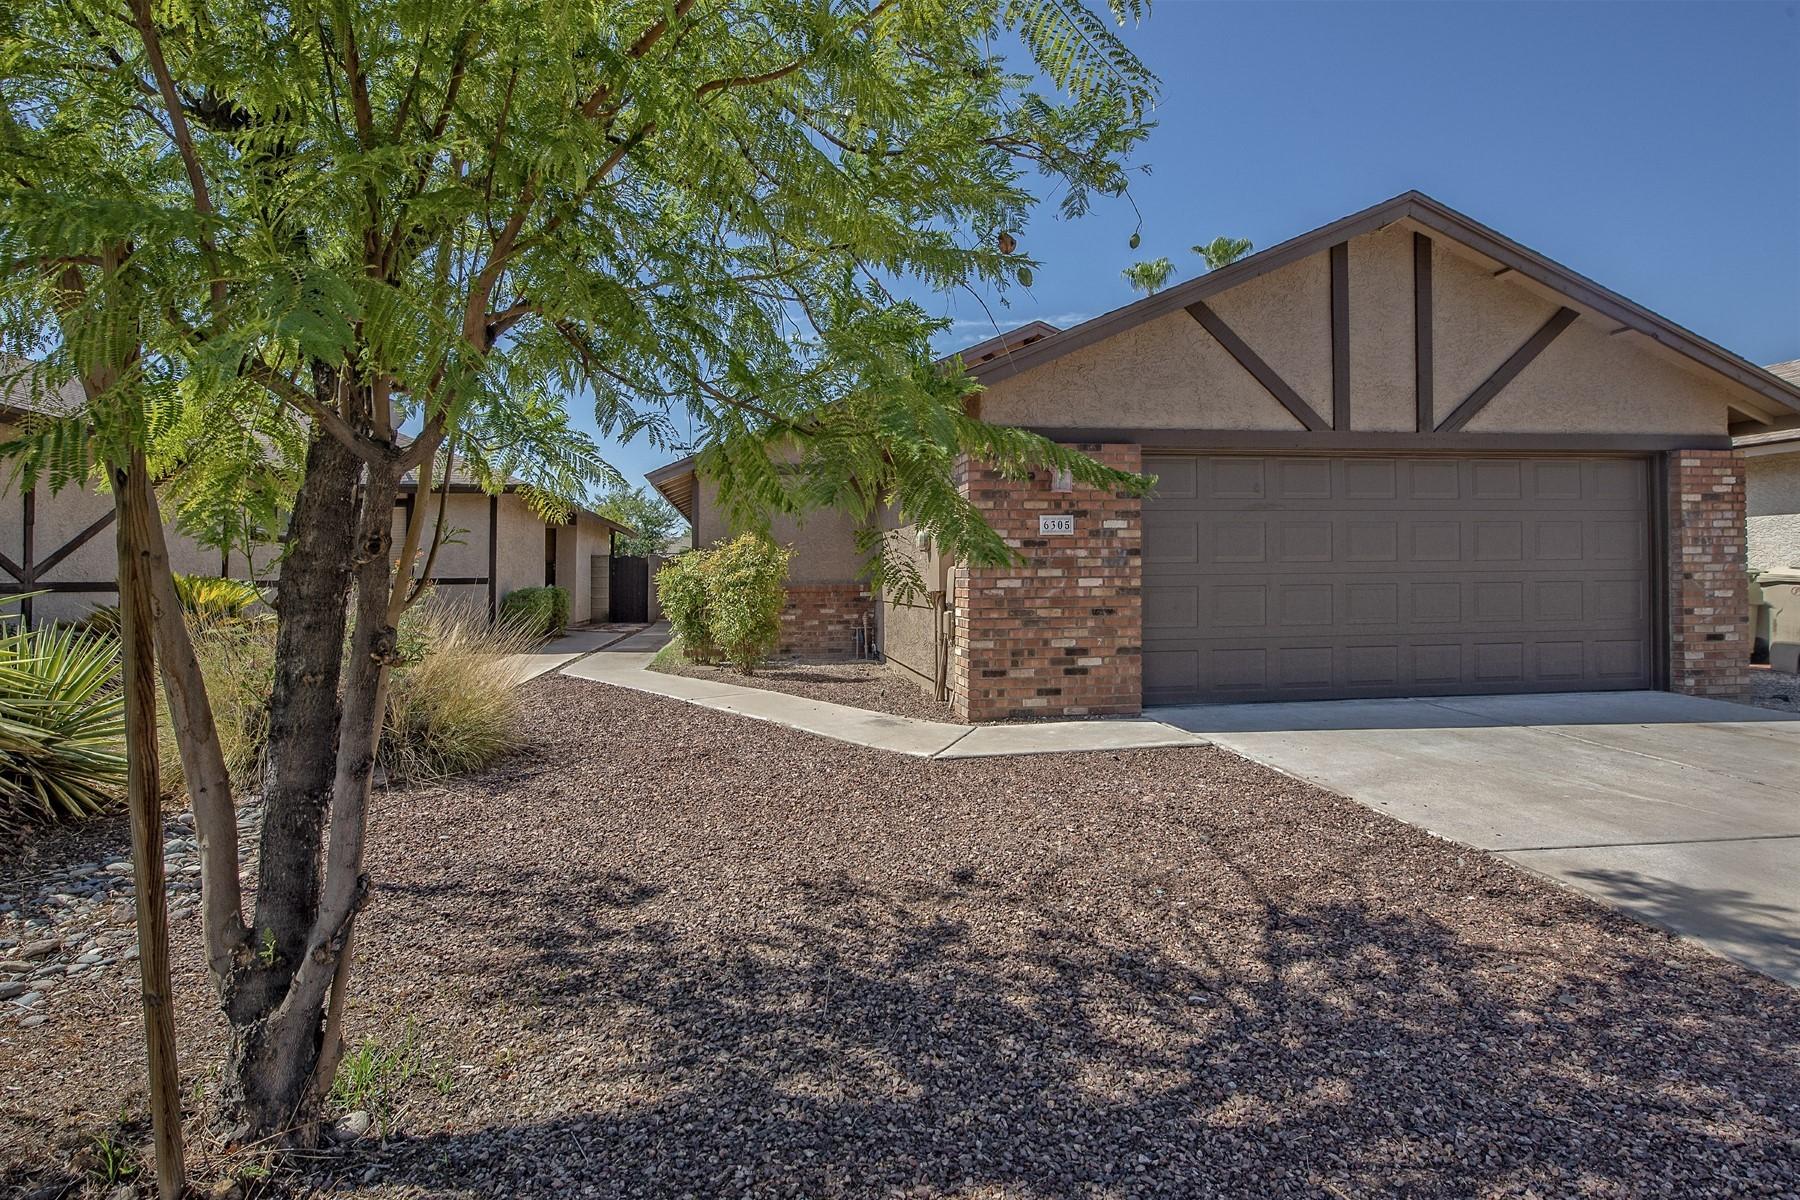 Single Family Homes for Active at Westbury 6305 W Desert Cove Ave Glendale, Arizona 85304 United States